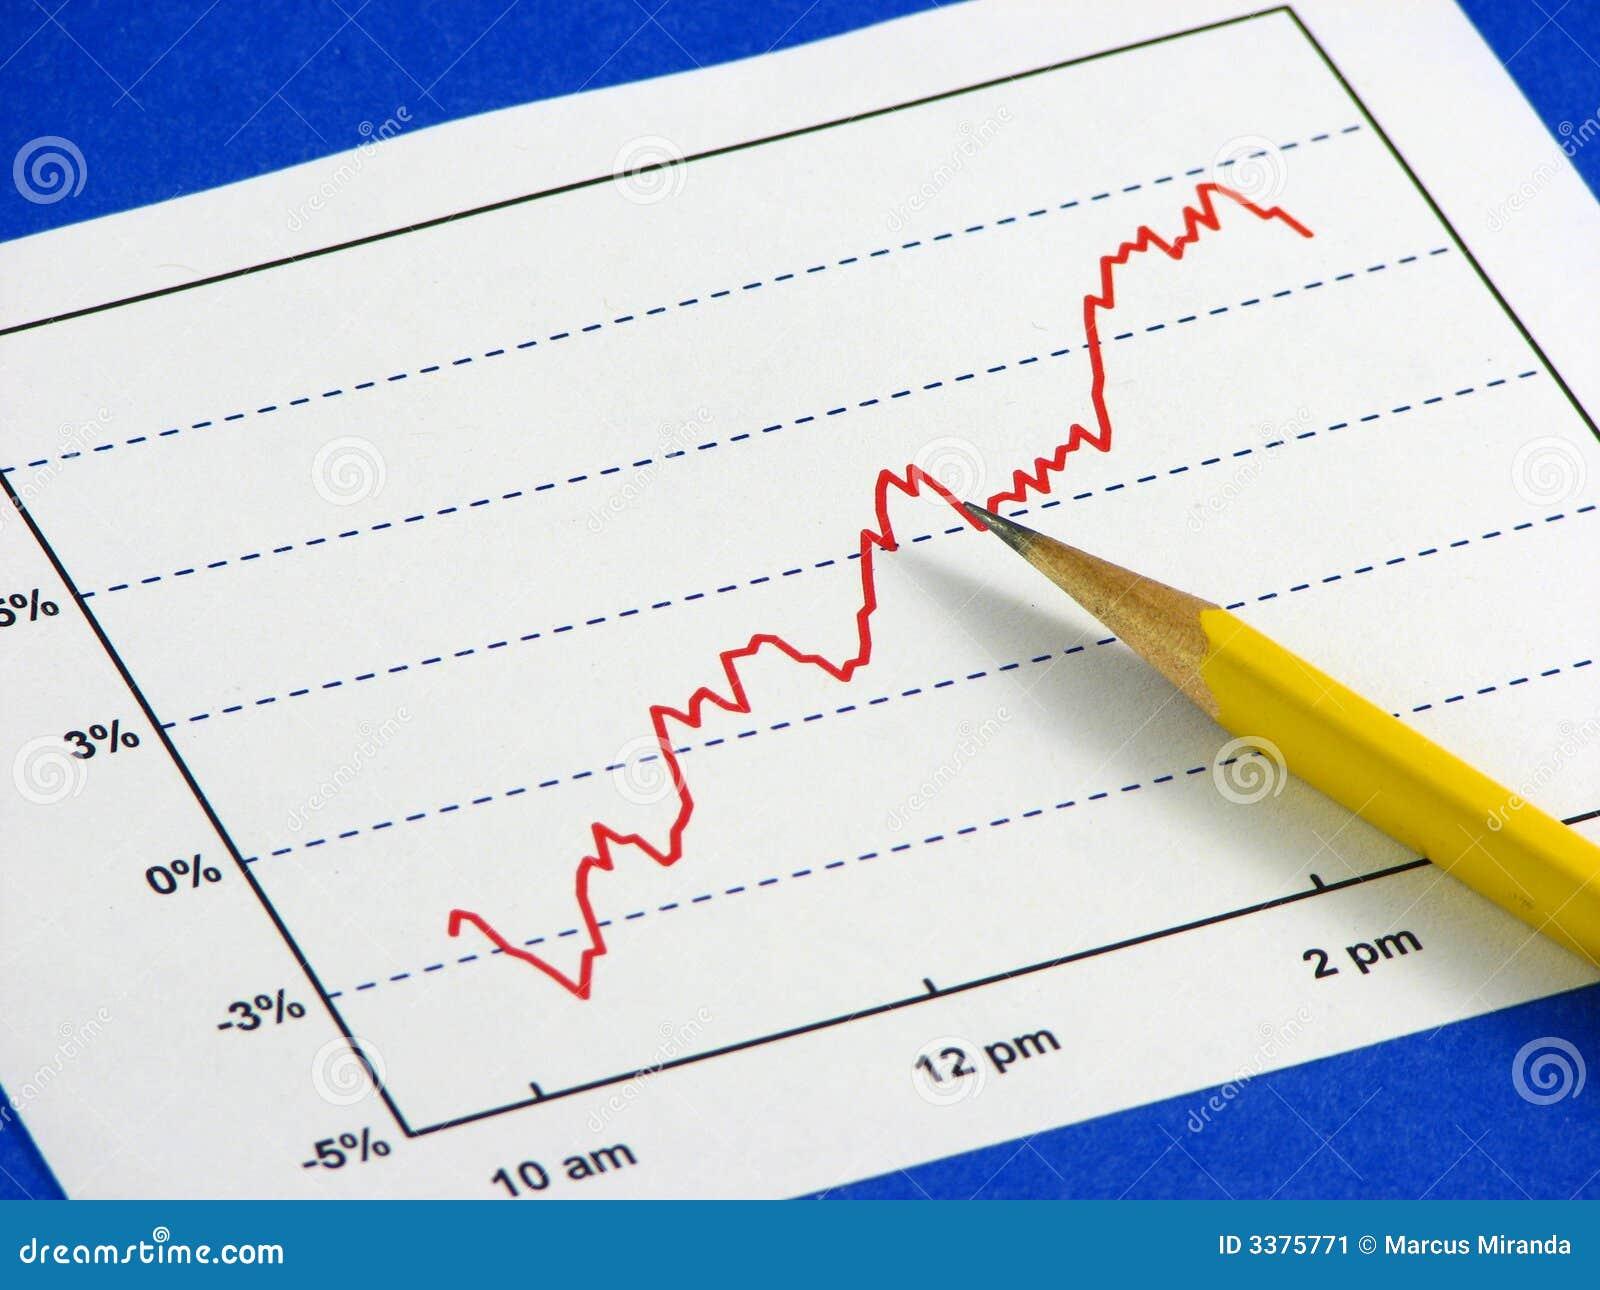 Marvelous Stock Market Analysis